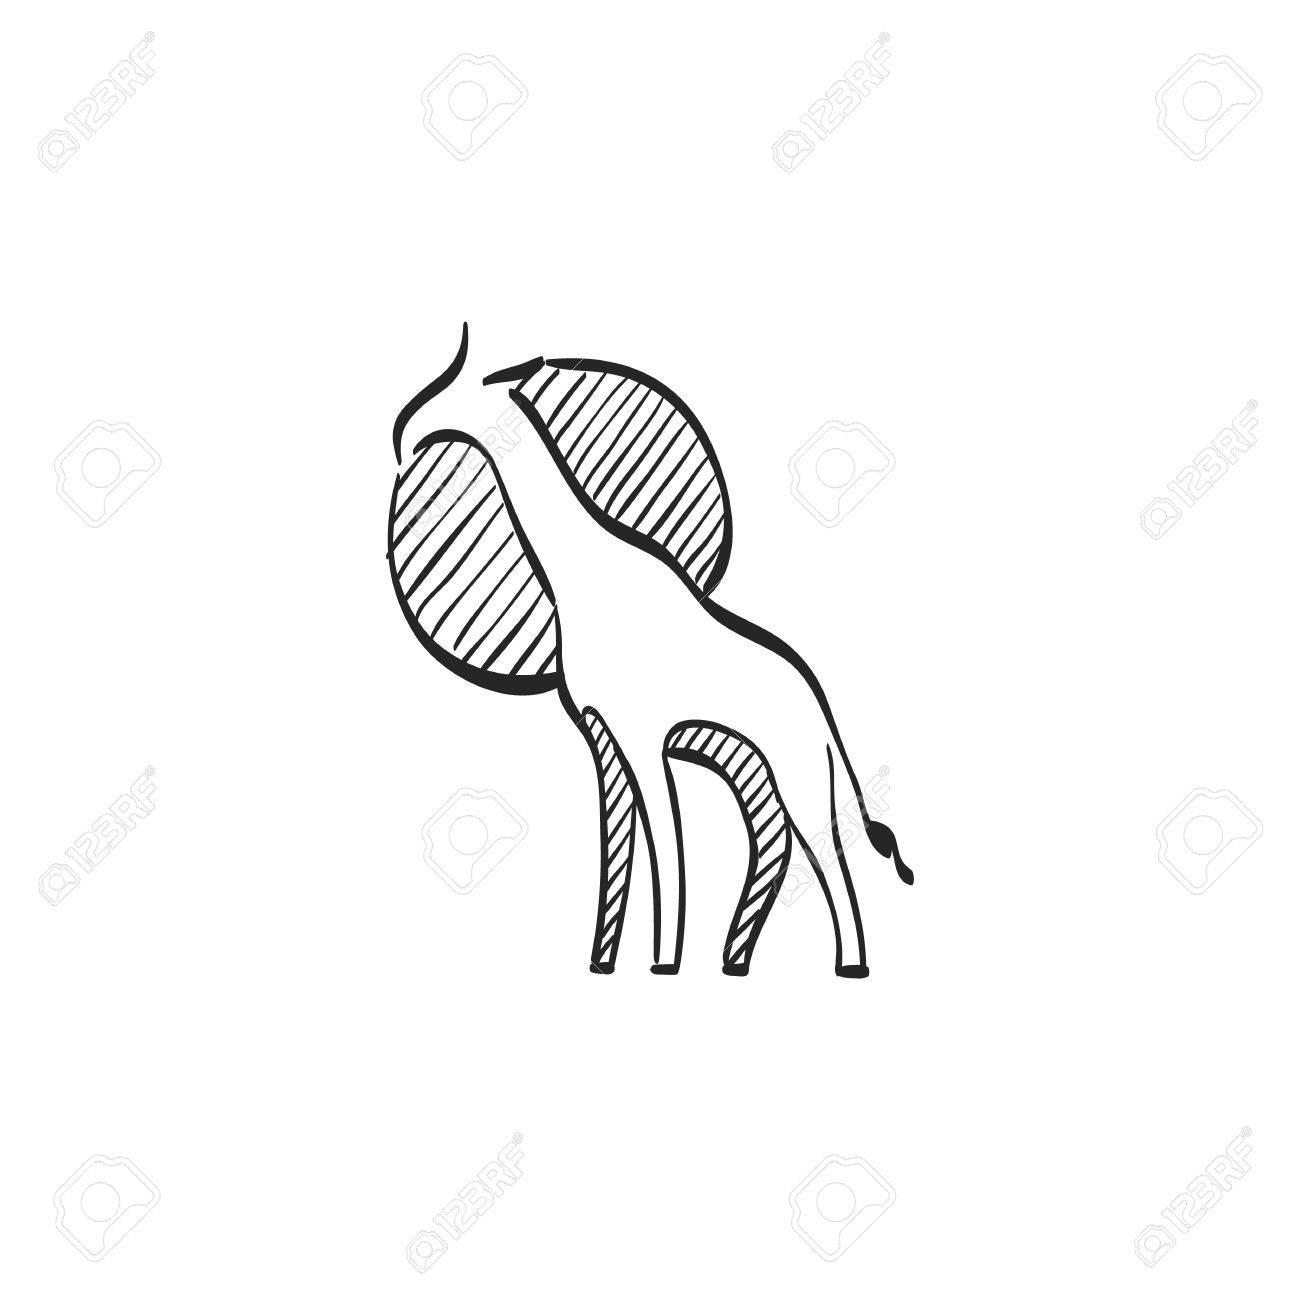 1300x1300 Giraffe Icon In Doodle Sketch Lines. Animal Mammal Herbivore